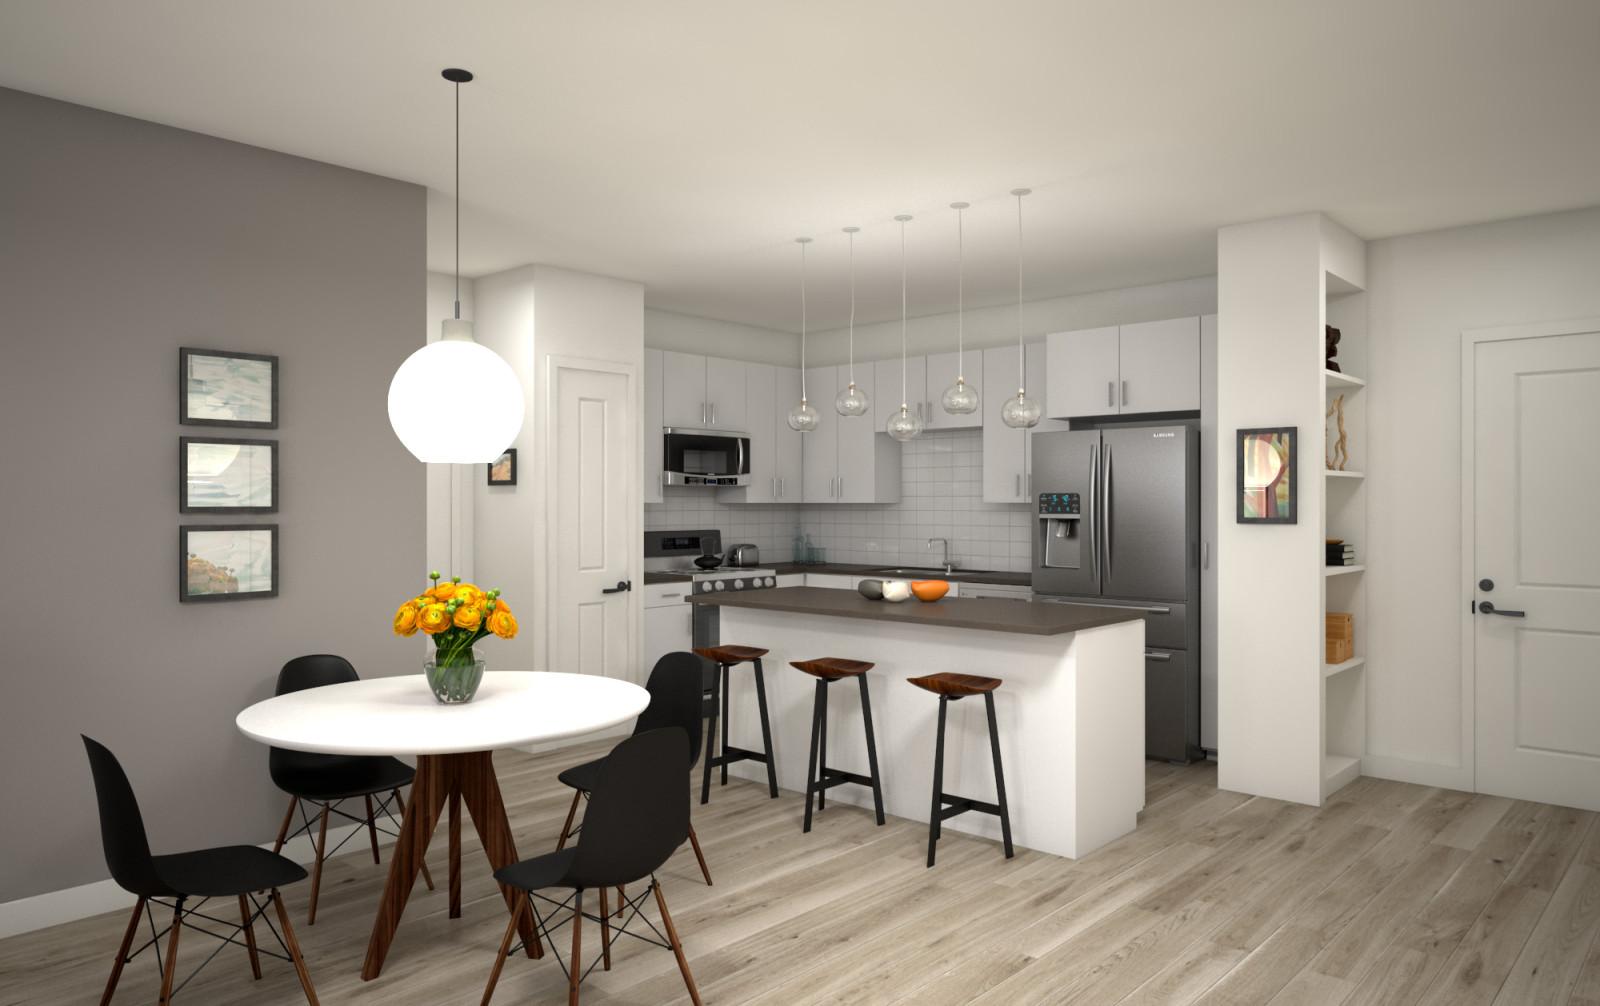 2017.06.26 277 Lofts kitchen [option A]